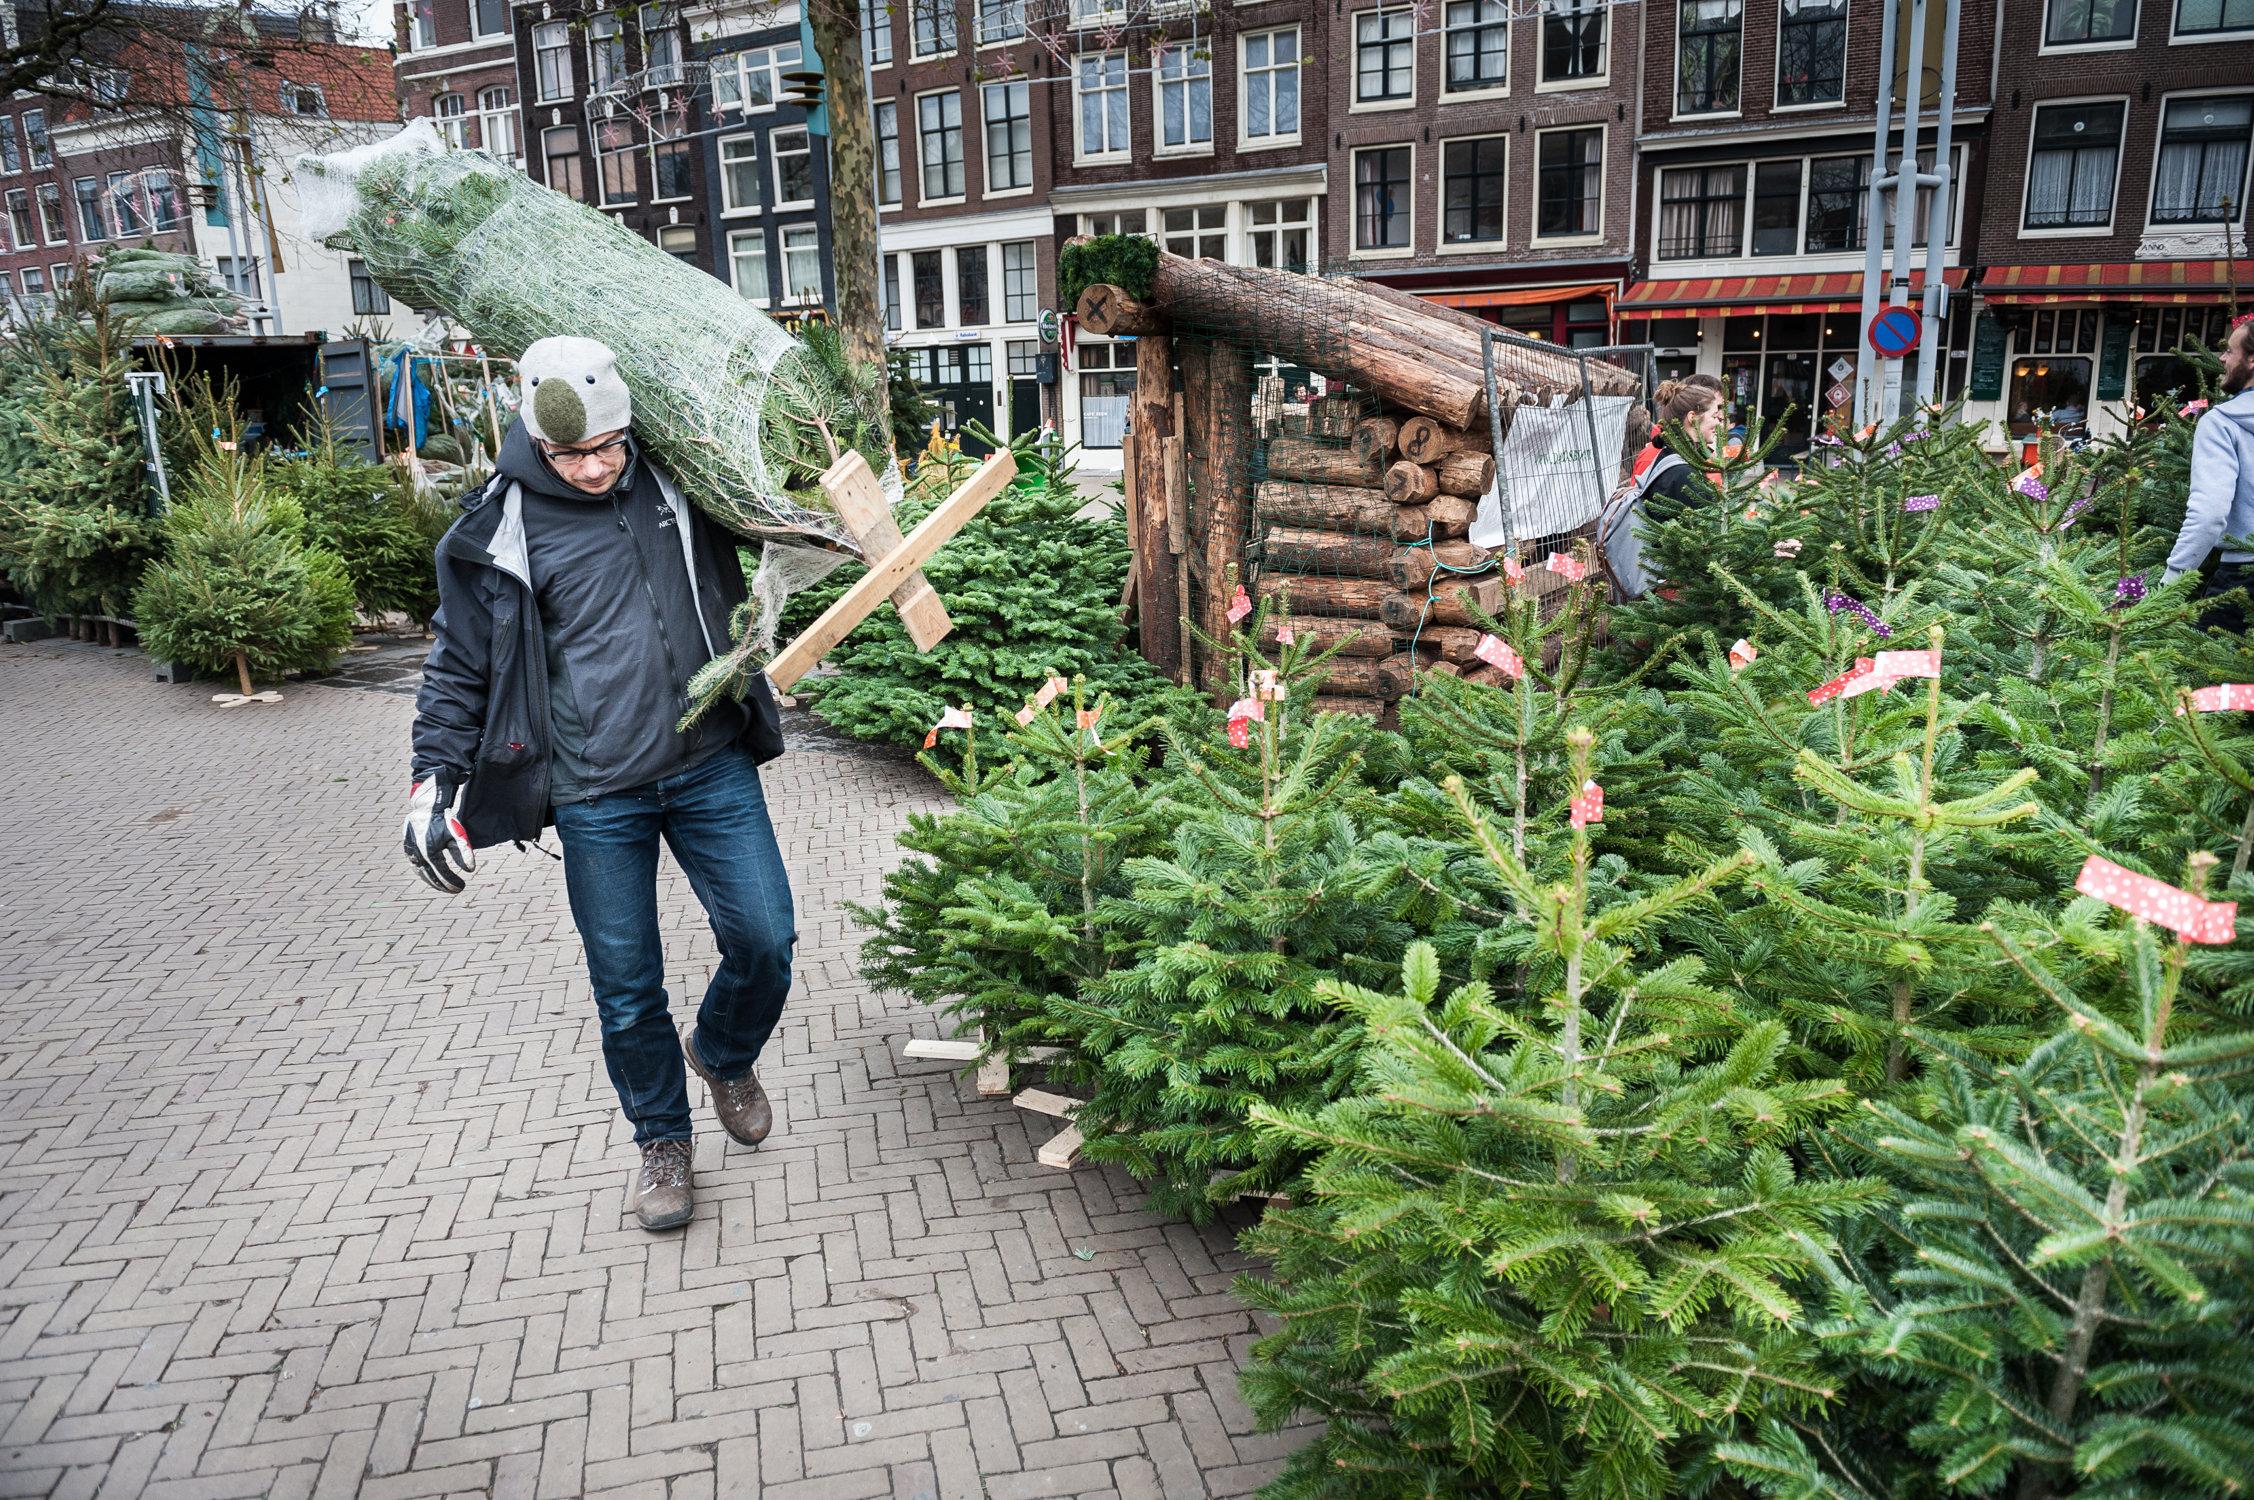 20131208-Kerstbomen.jpg